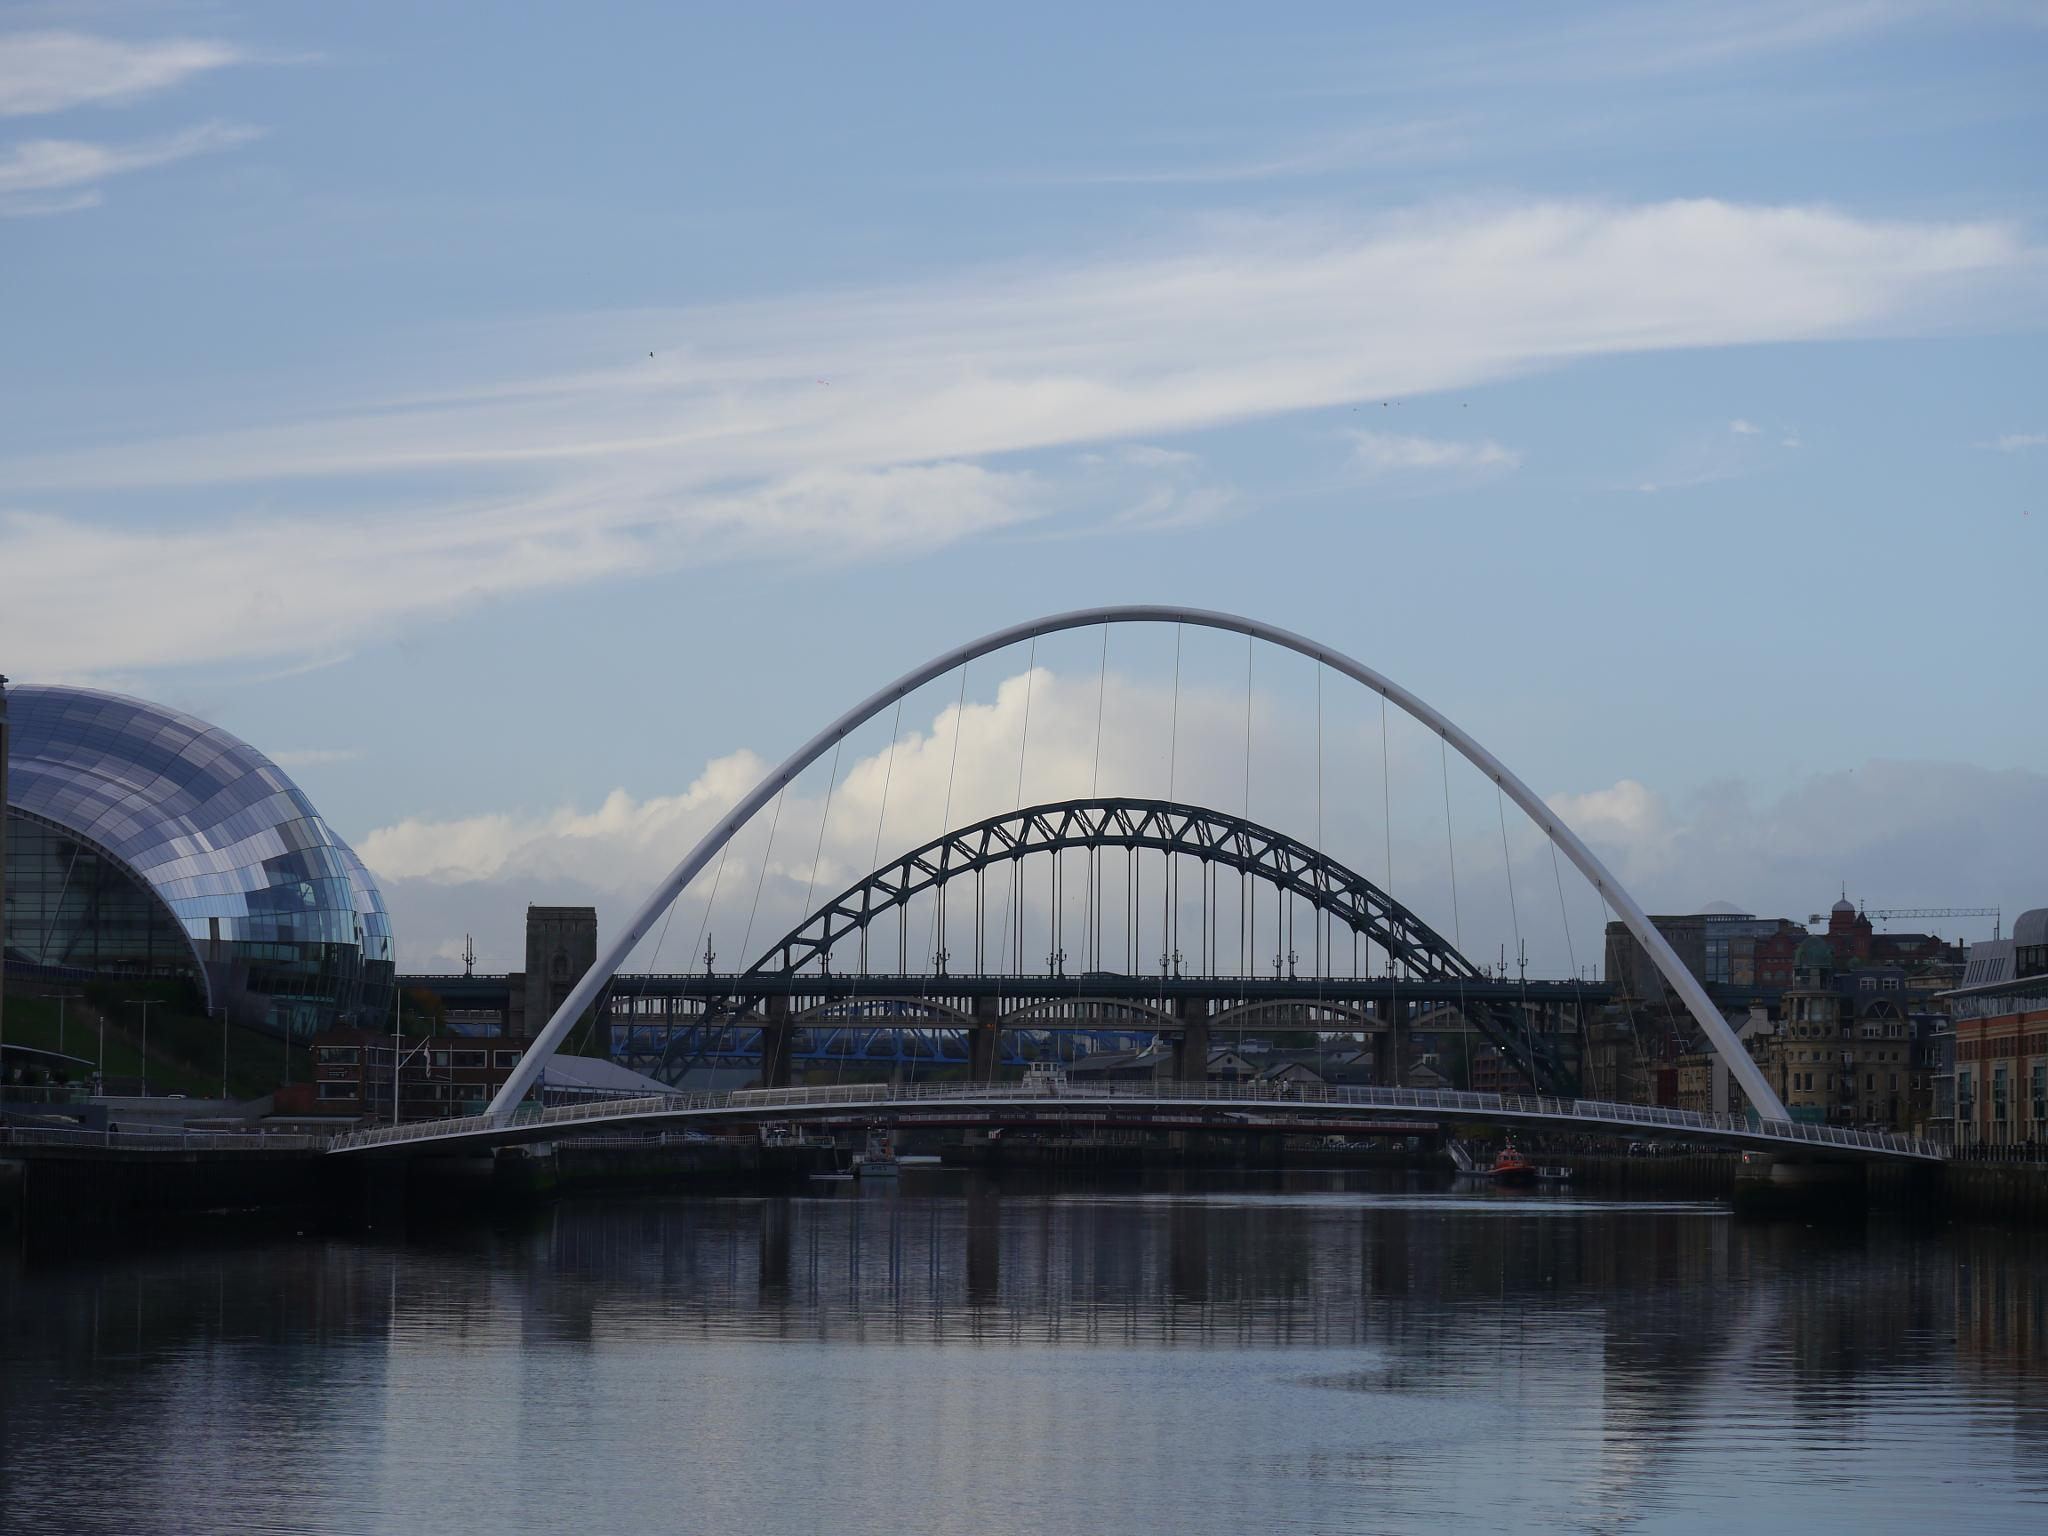 River Tyne Newcastle by Darren Turner